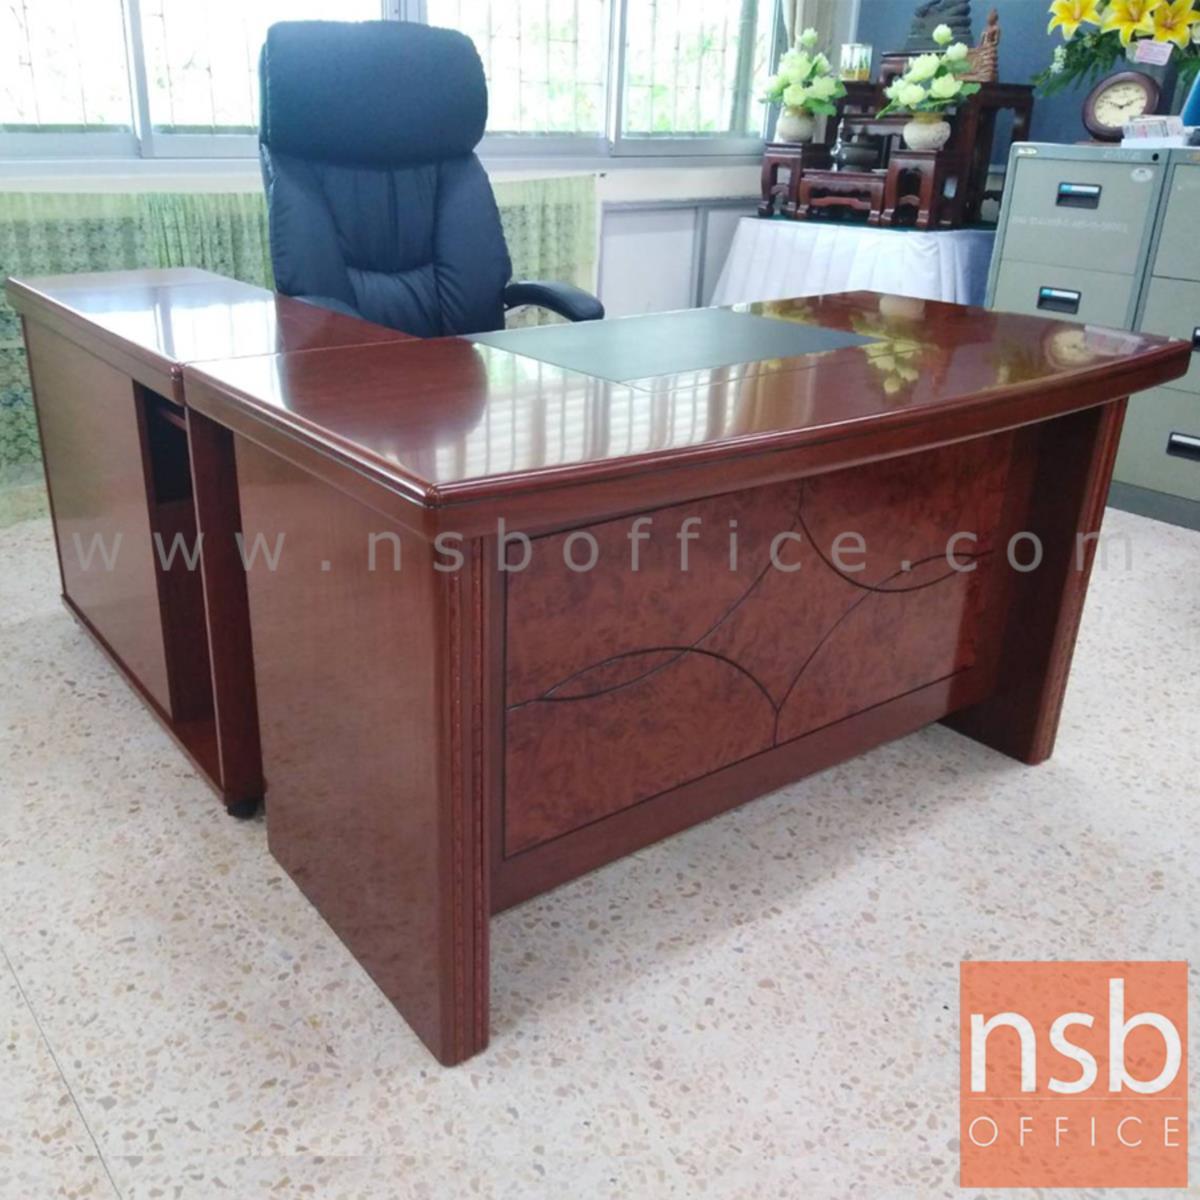 A06A044:โต๊ะผู้บริหารตัวแอล 4 ลิ้นชัก  รุ่น Pleasant (พลีเซนต์) ขนาด 140W cm. พร้อมตู้ข้าง